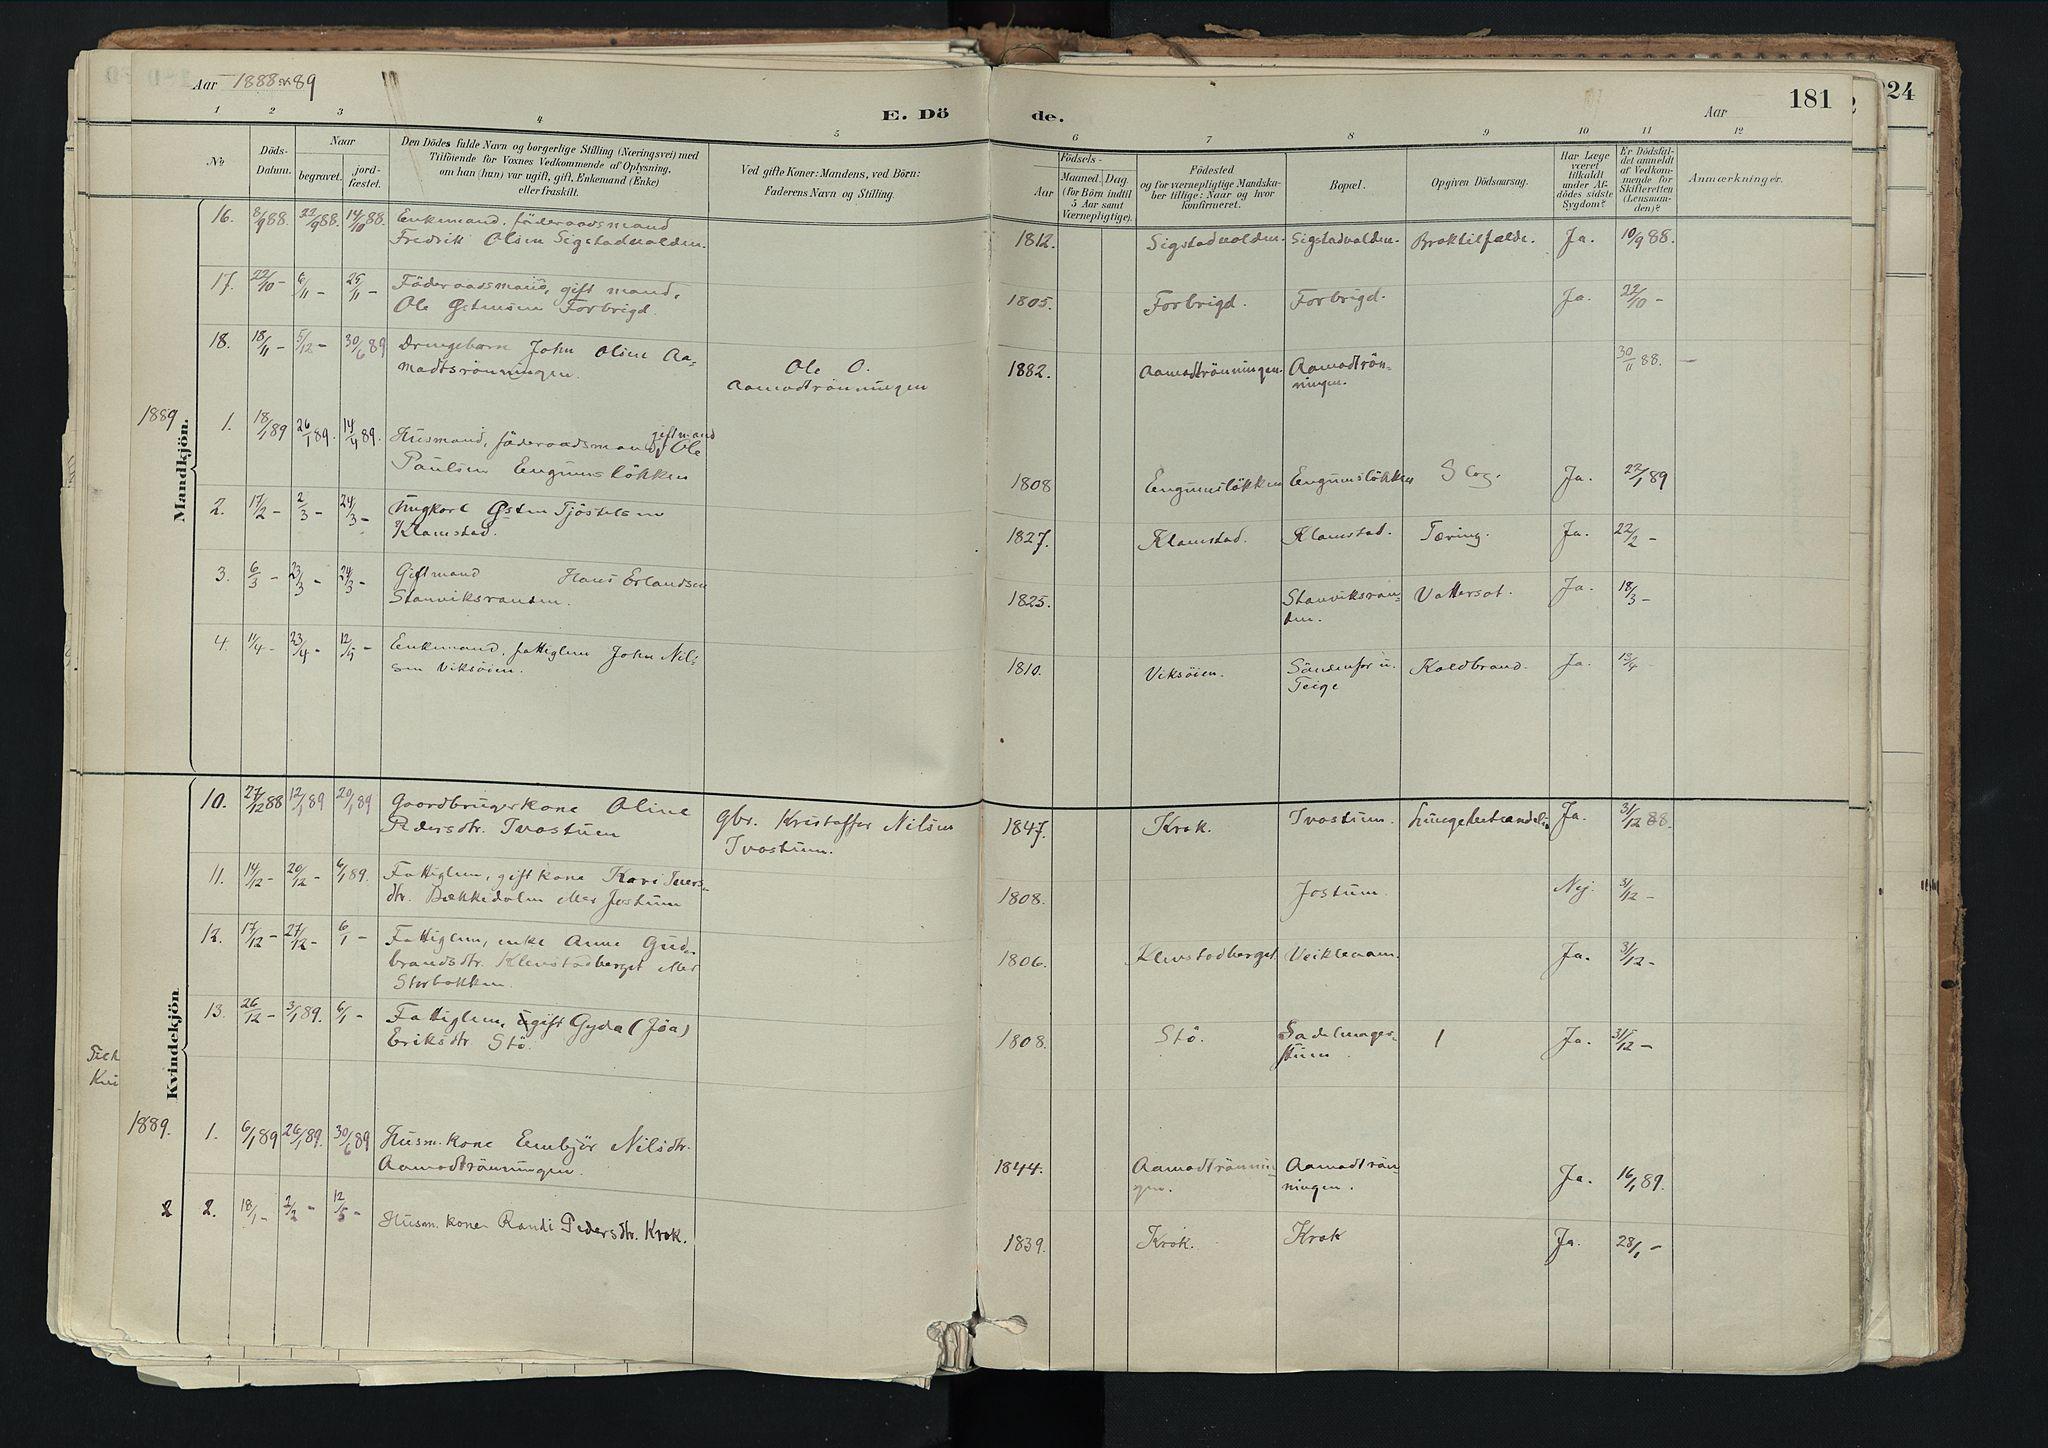 SAH, Nord-Fron prestekontor, Ministerialbok nr. 3, 1884-1914, s. 181